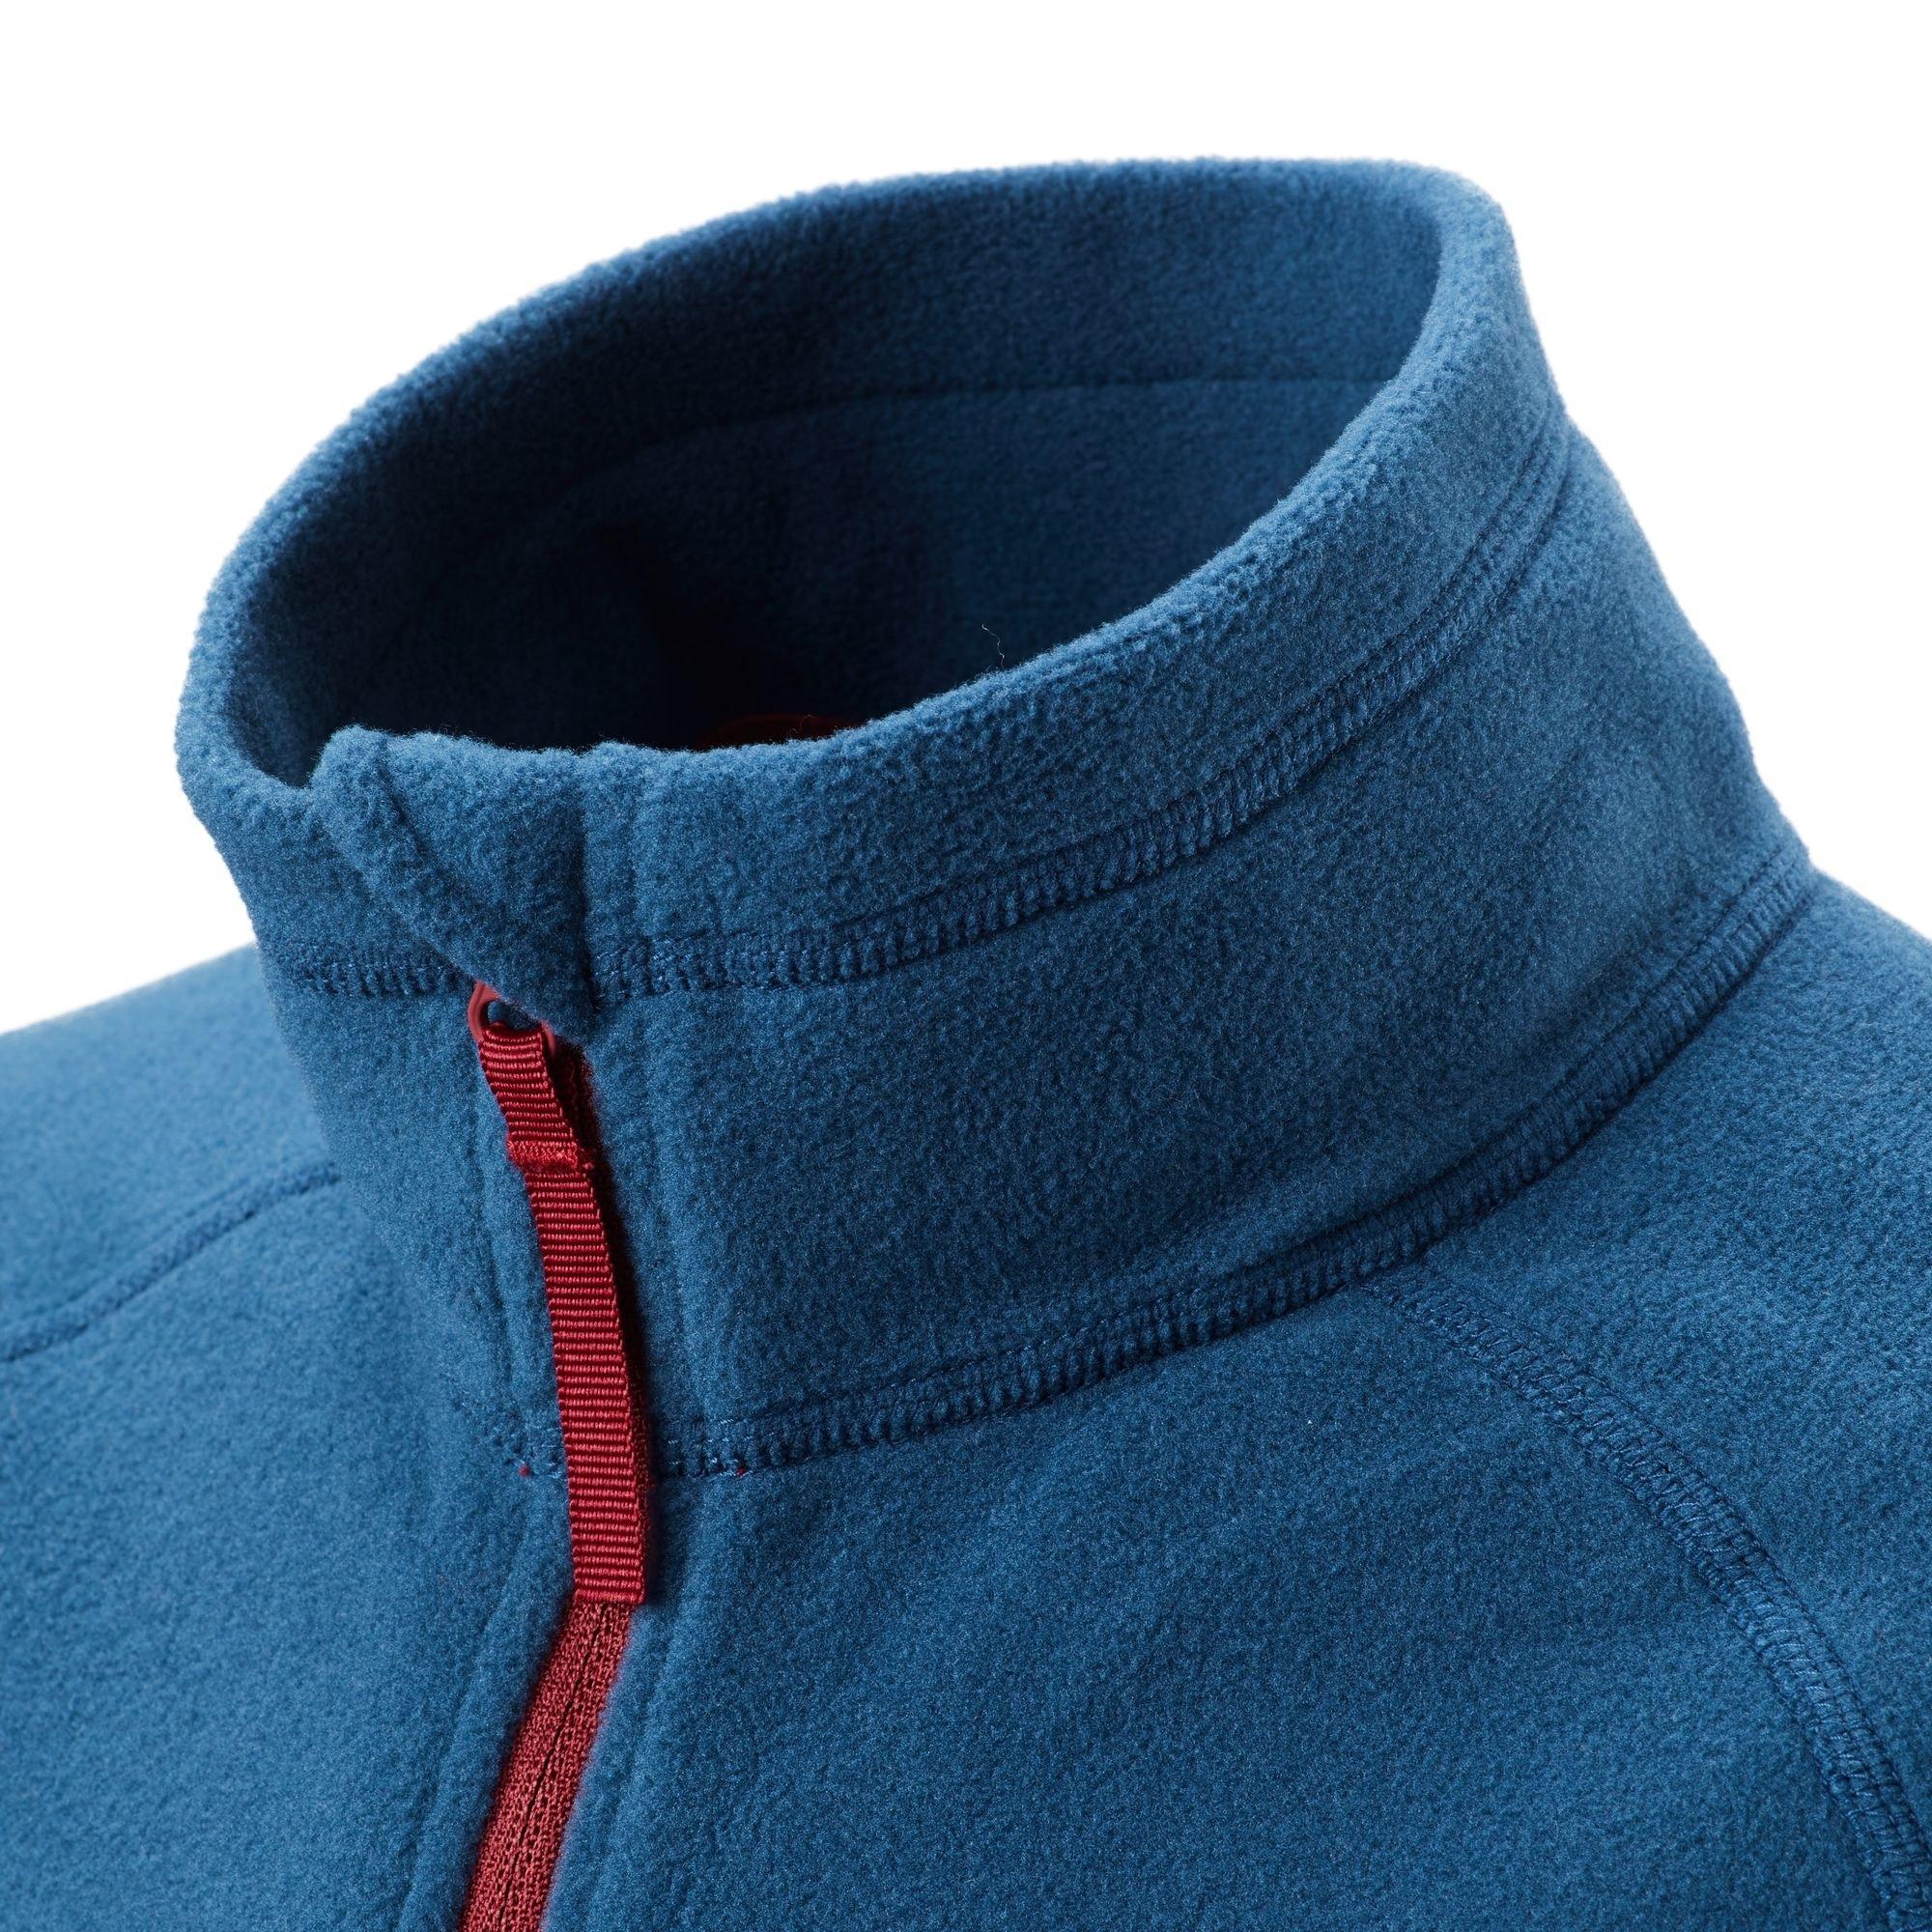 NEW-Kathmandu-Ridge-Kids-039-Girls-039-Boys-039-Warm-Fleece-Jacket-1-4-Zip-Pullover-Top thumbnail 23